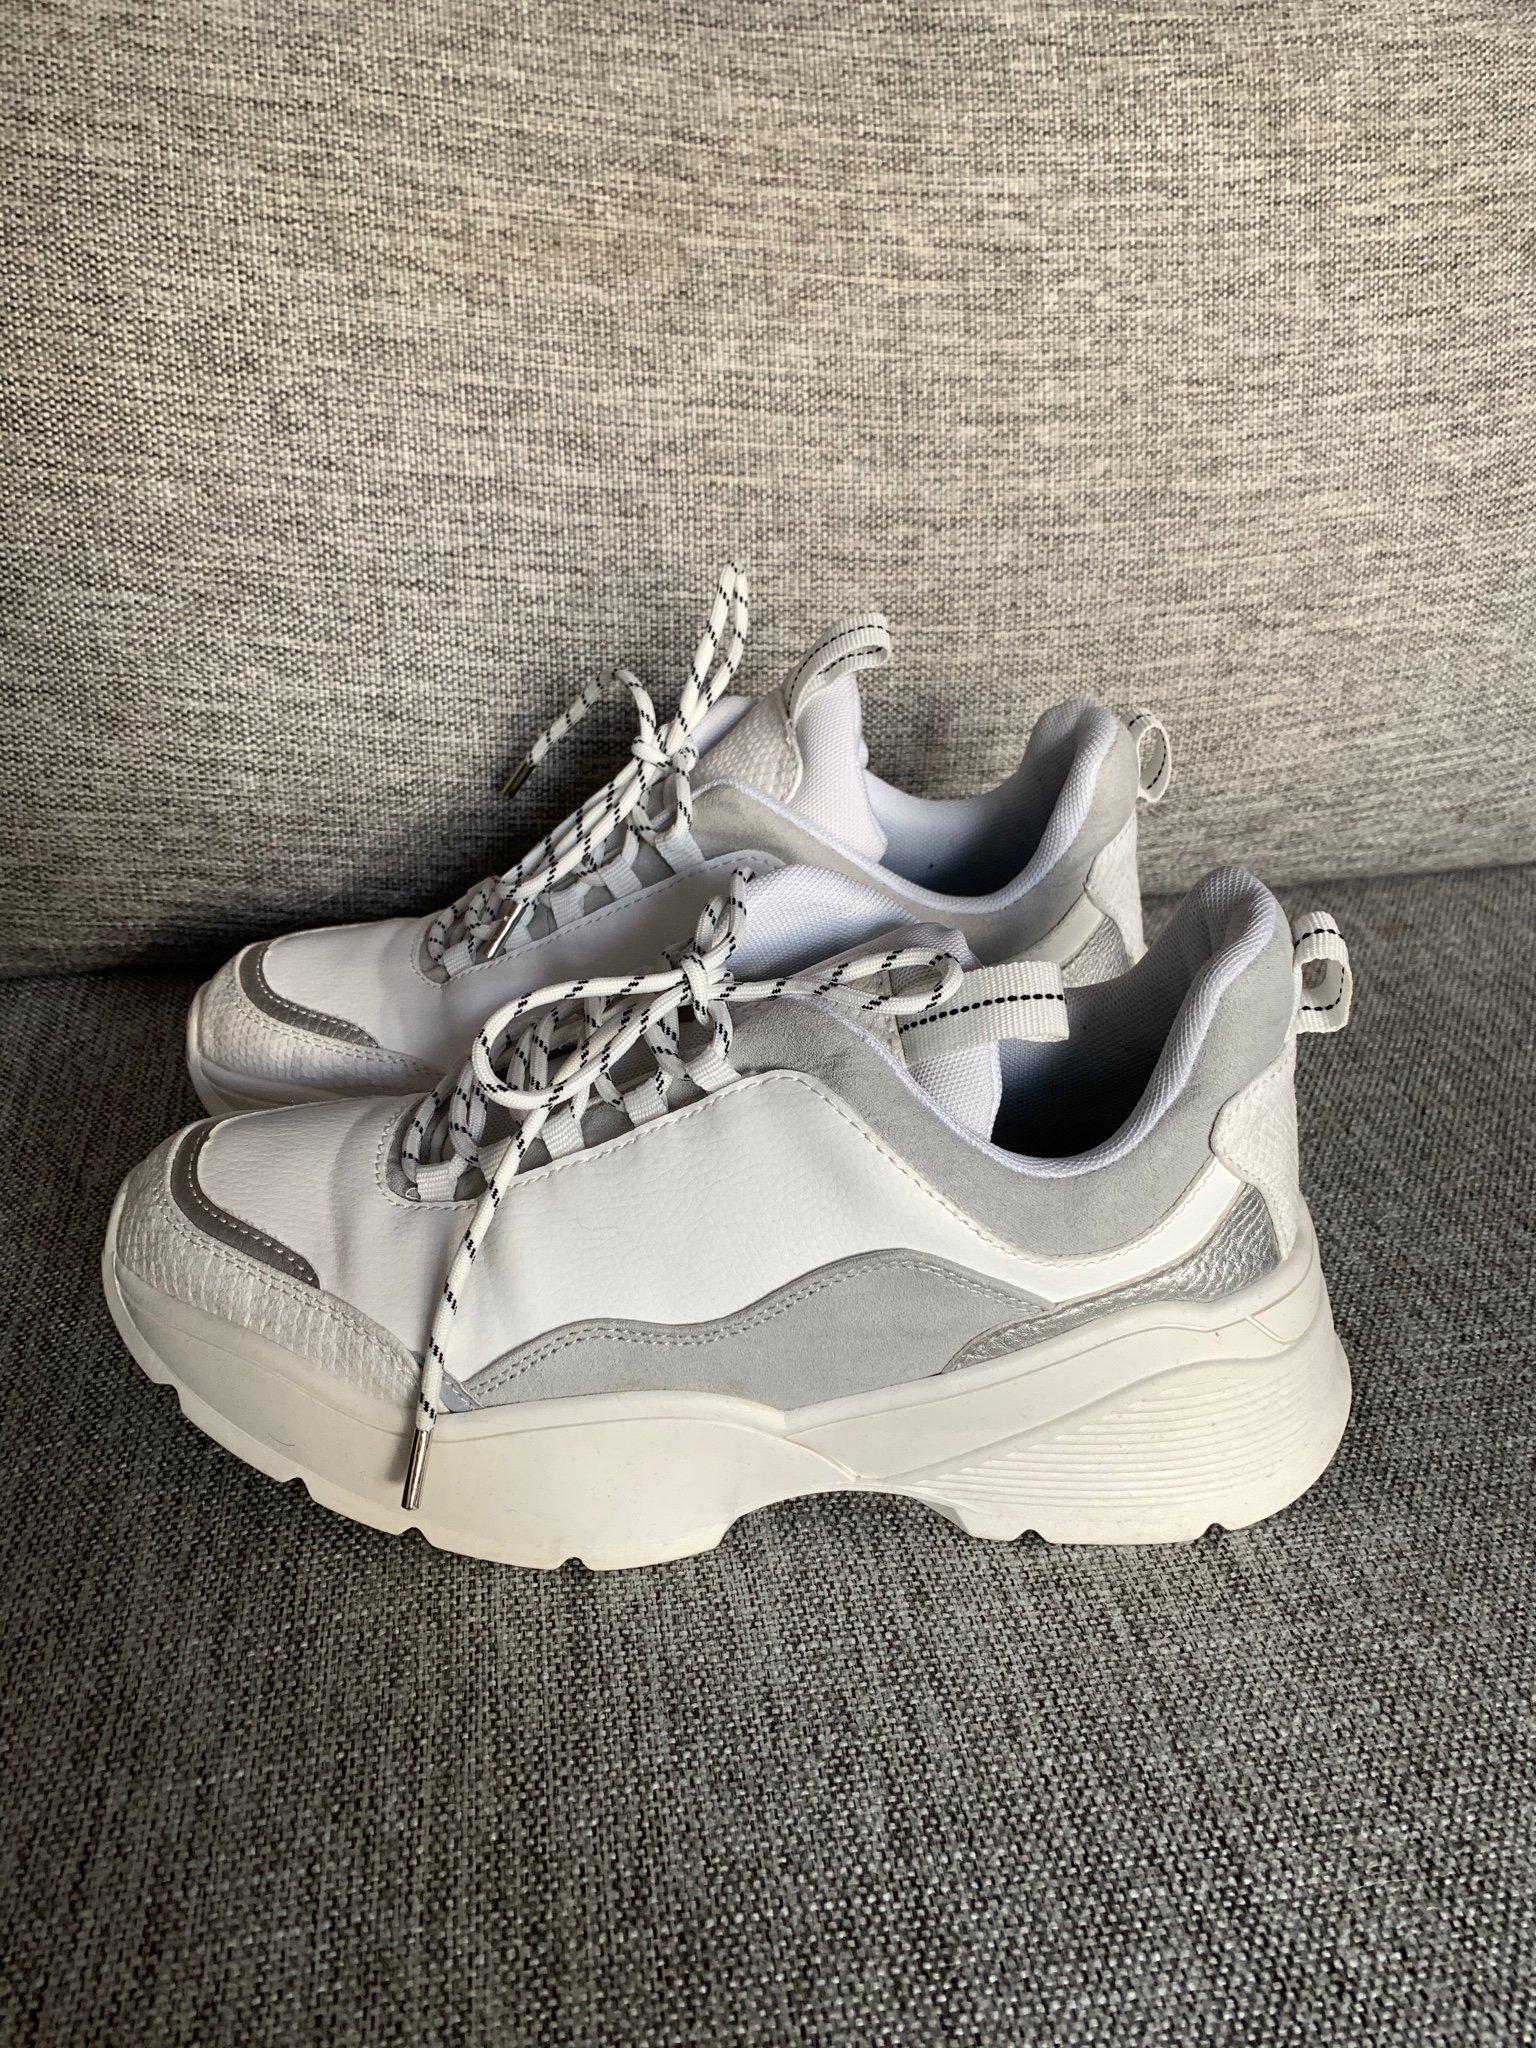 Chunky sneakers trend skor grov sula hm H&m 38